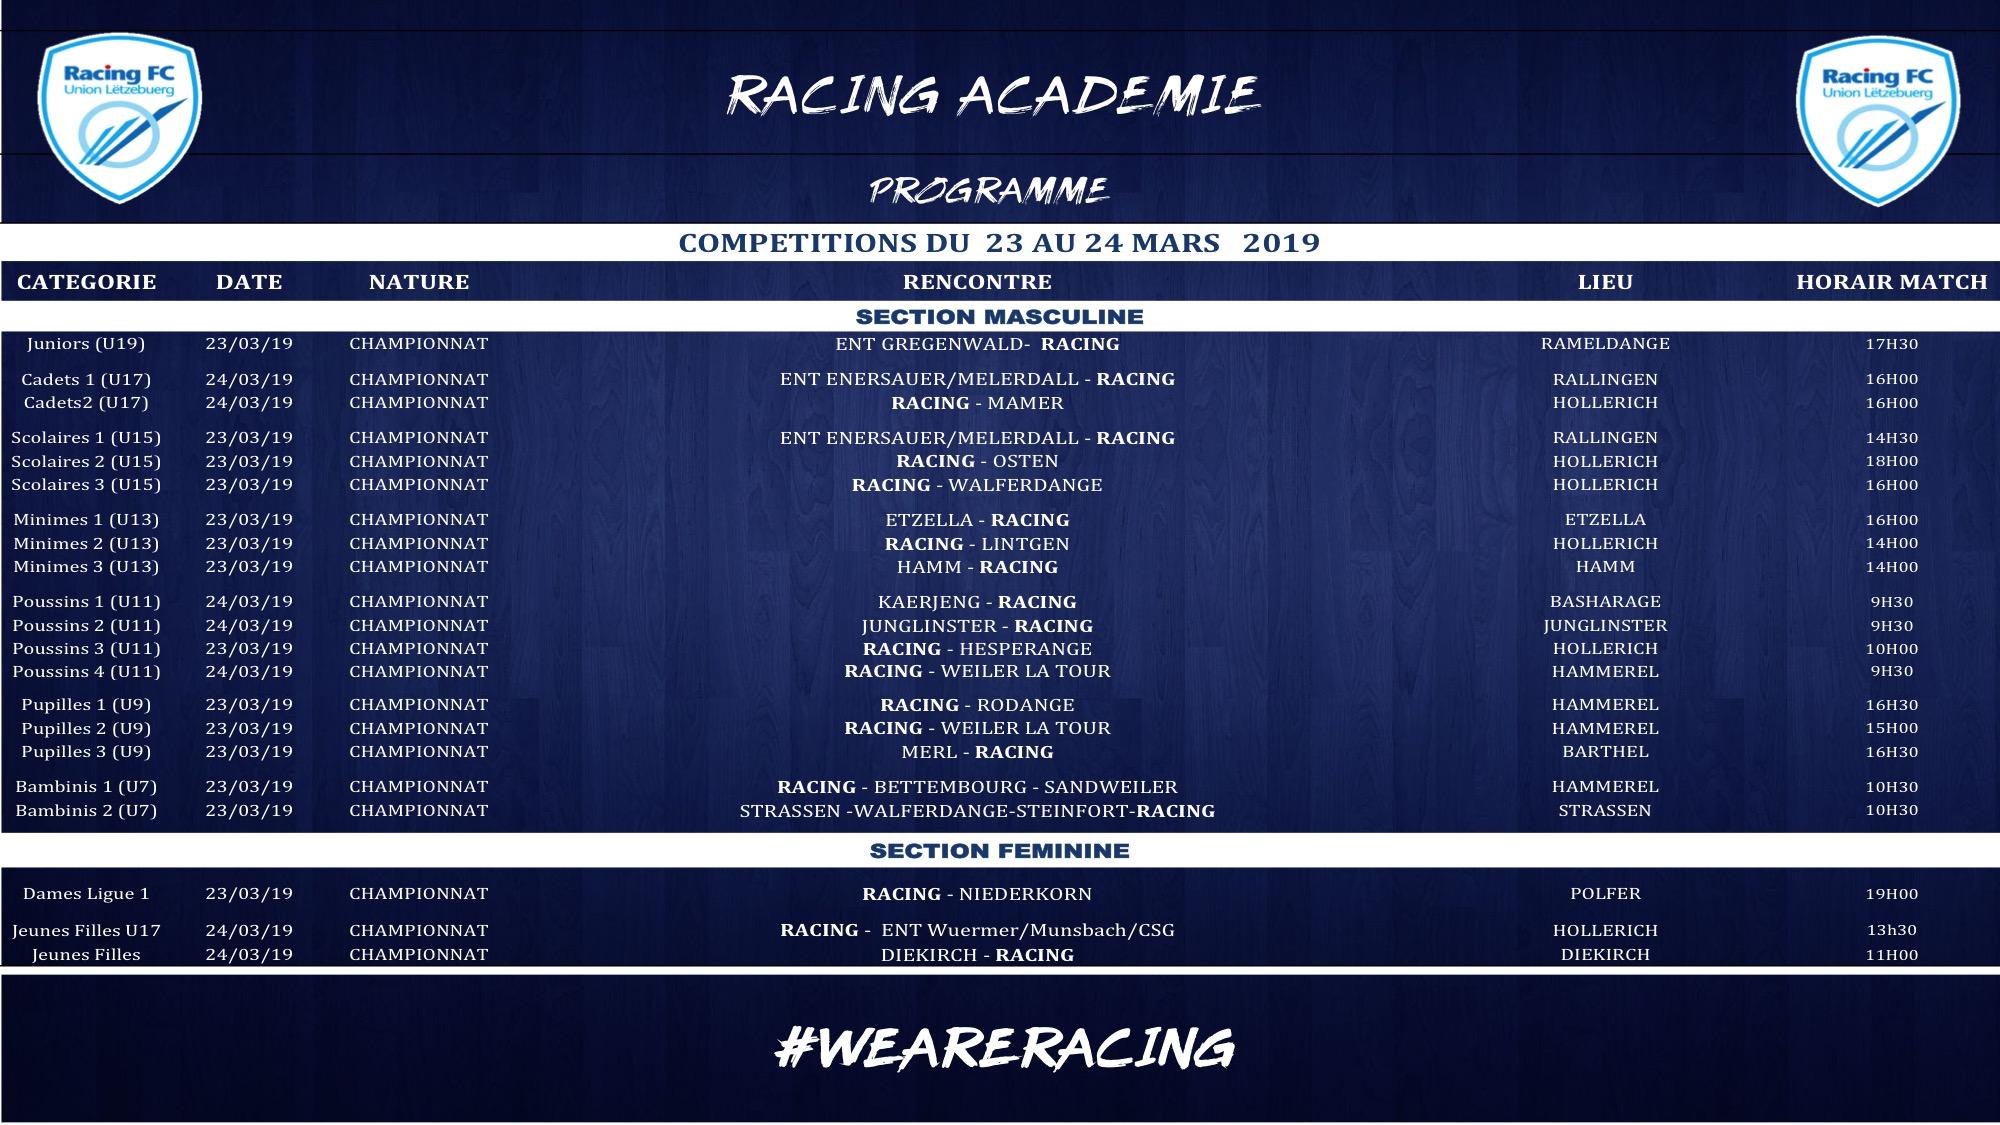 Programme match RACING ACADEMIE 23-24 mars 2019